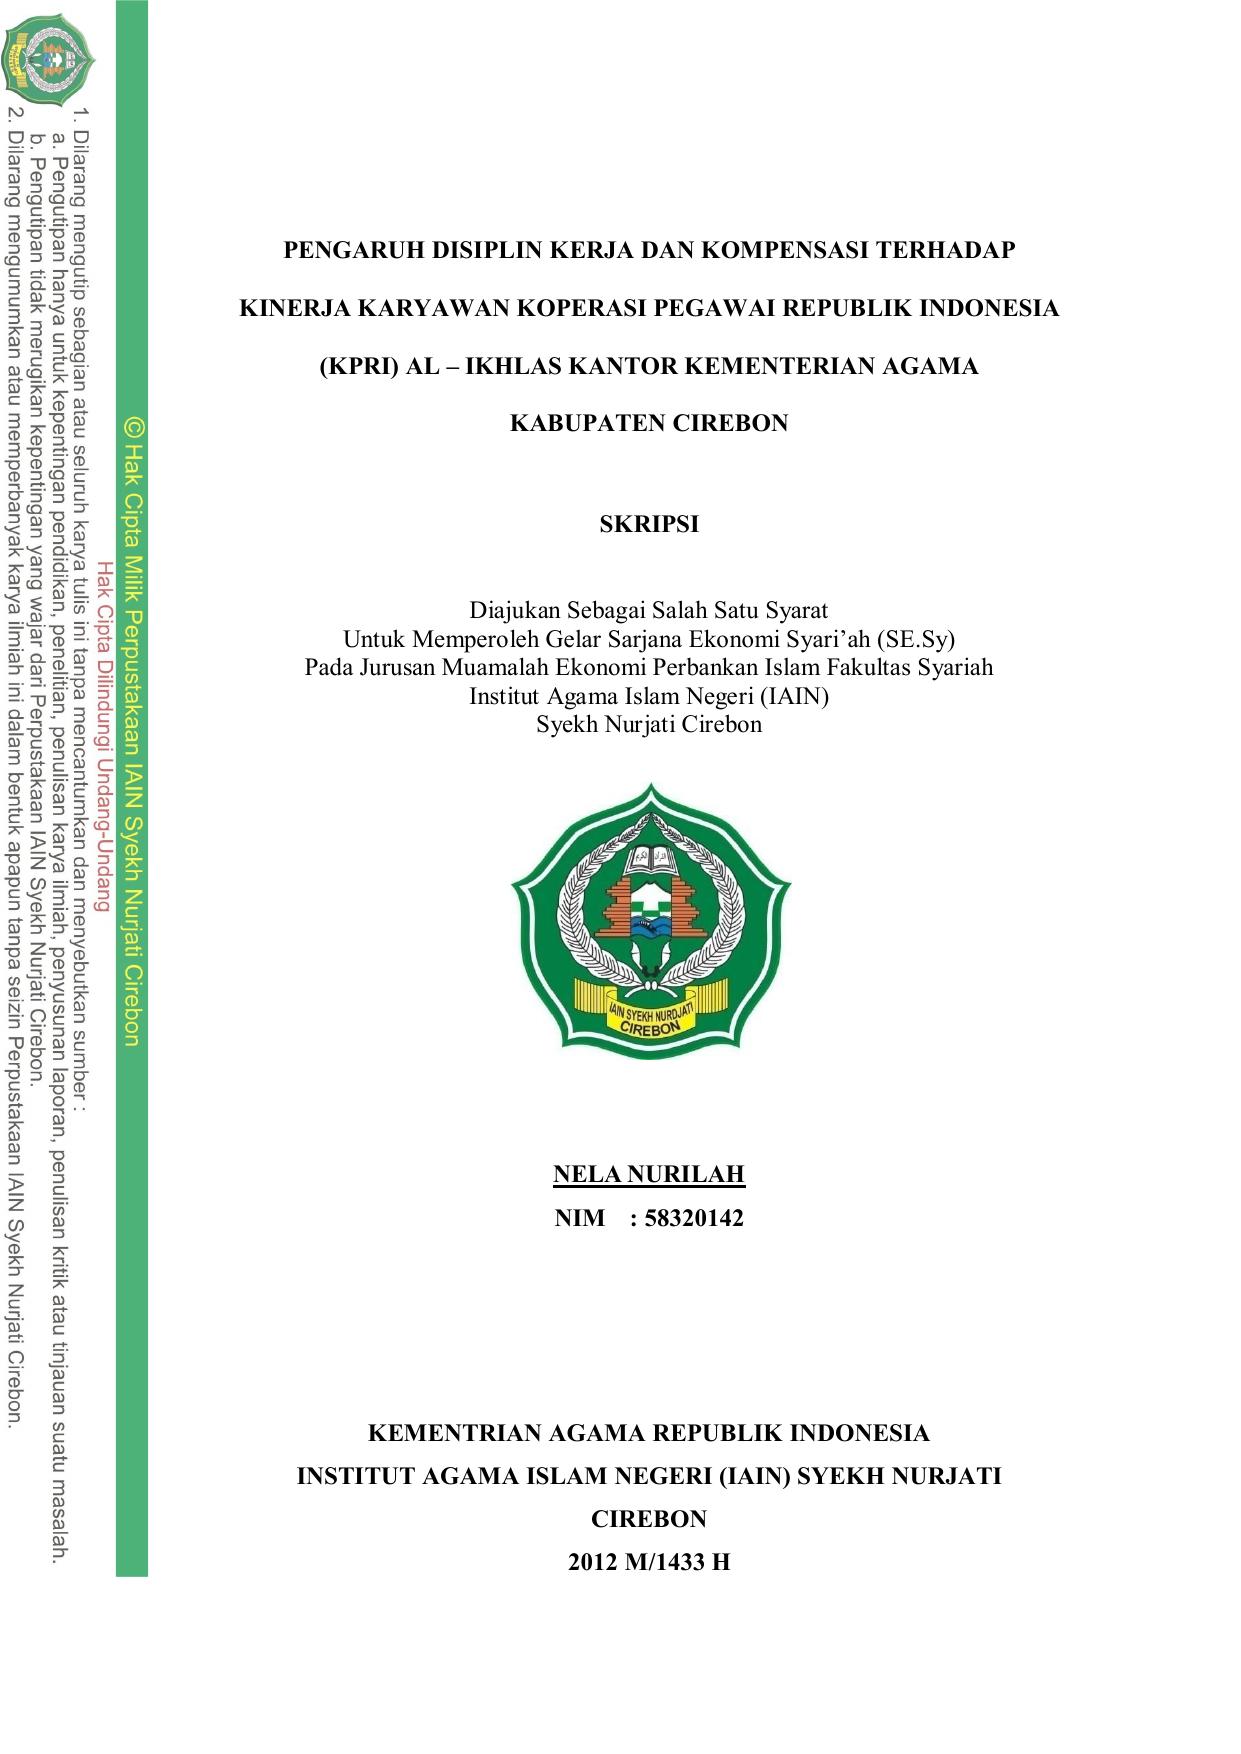 Pdf Pengaruh Kompensasi Dan Motivasi Terhadap Kinerja Karyawan Pt Bank Ekonomi Raharja Tbk Area Jakarta 5